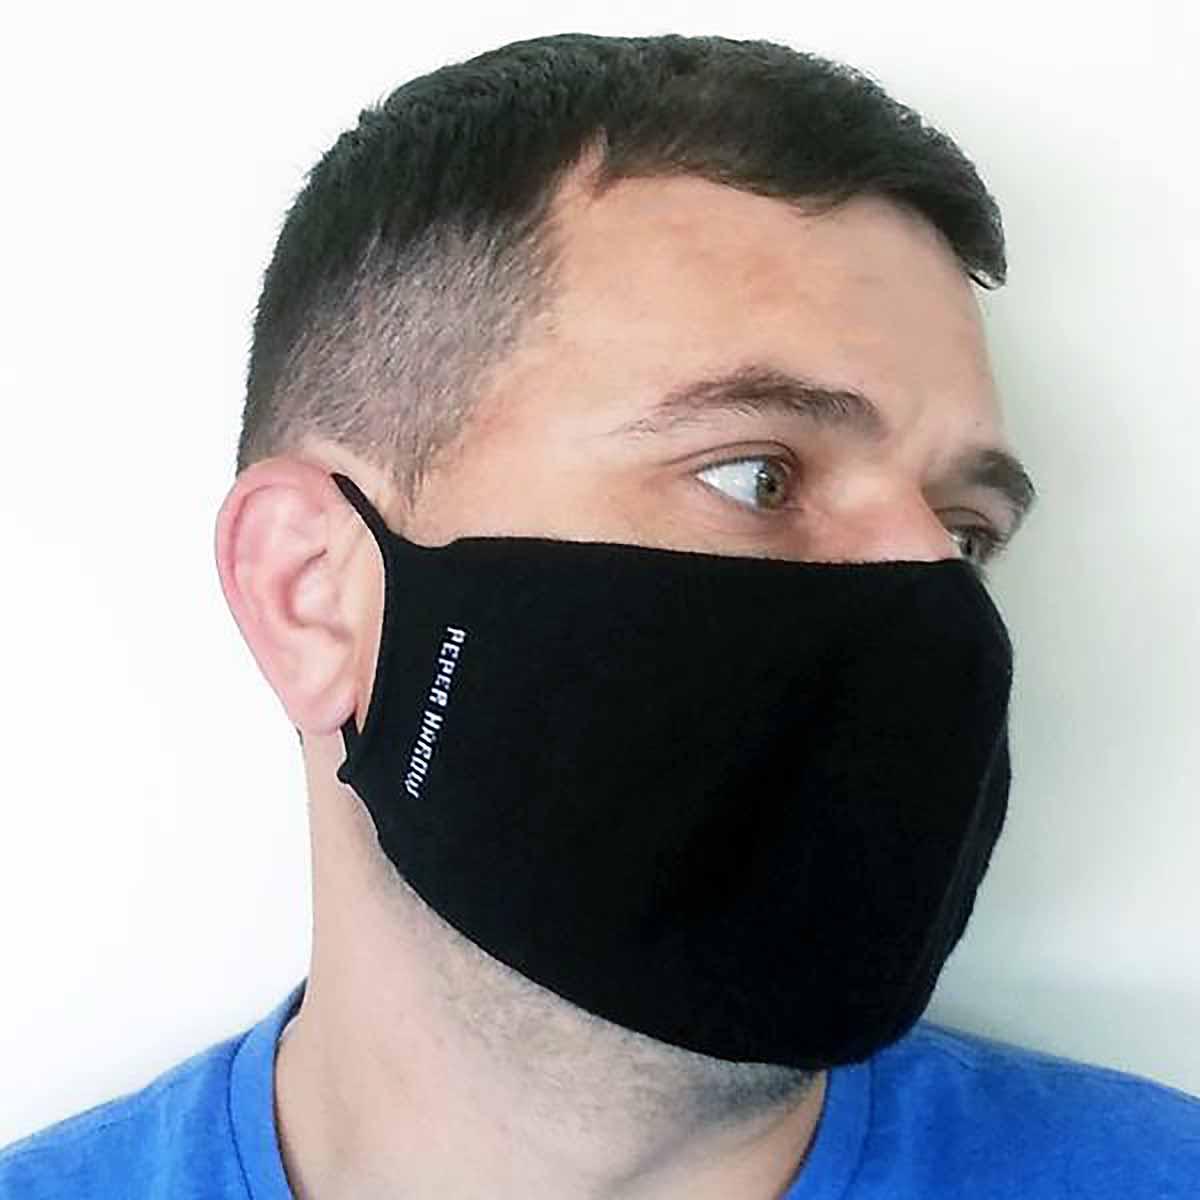 man wearing mask side view